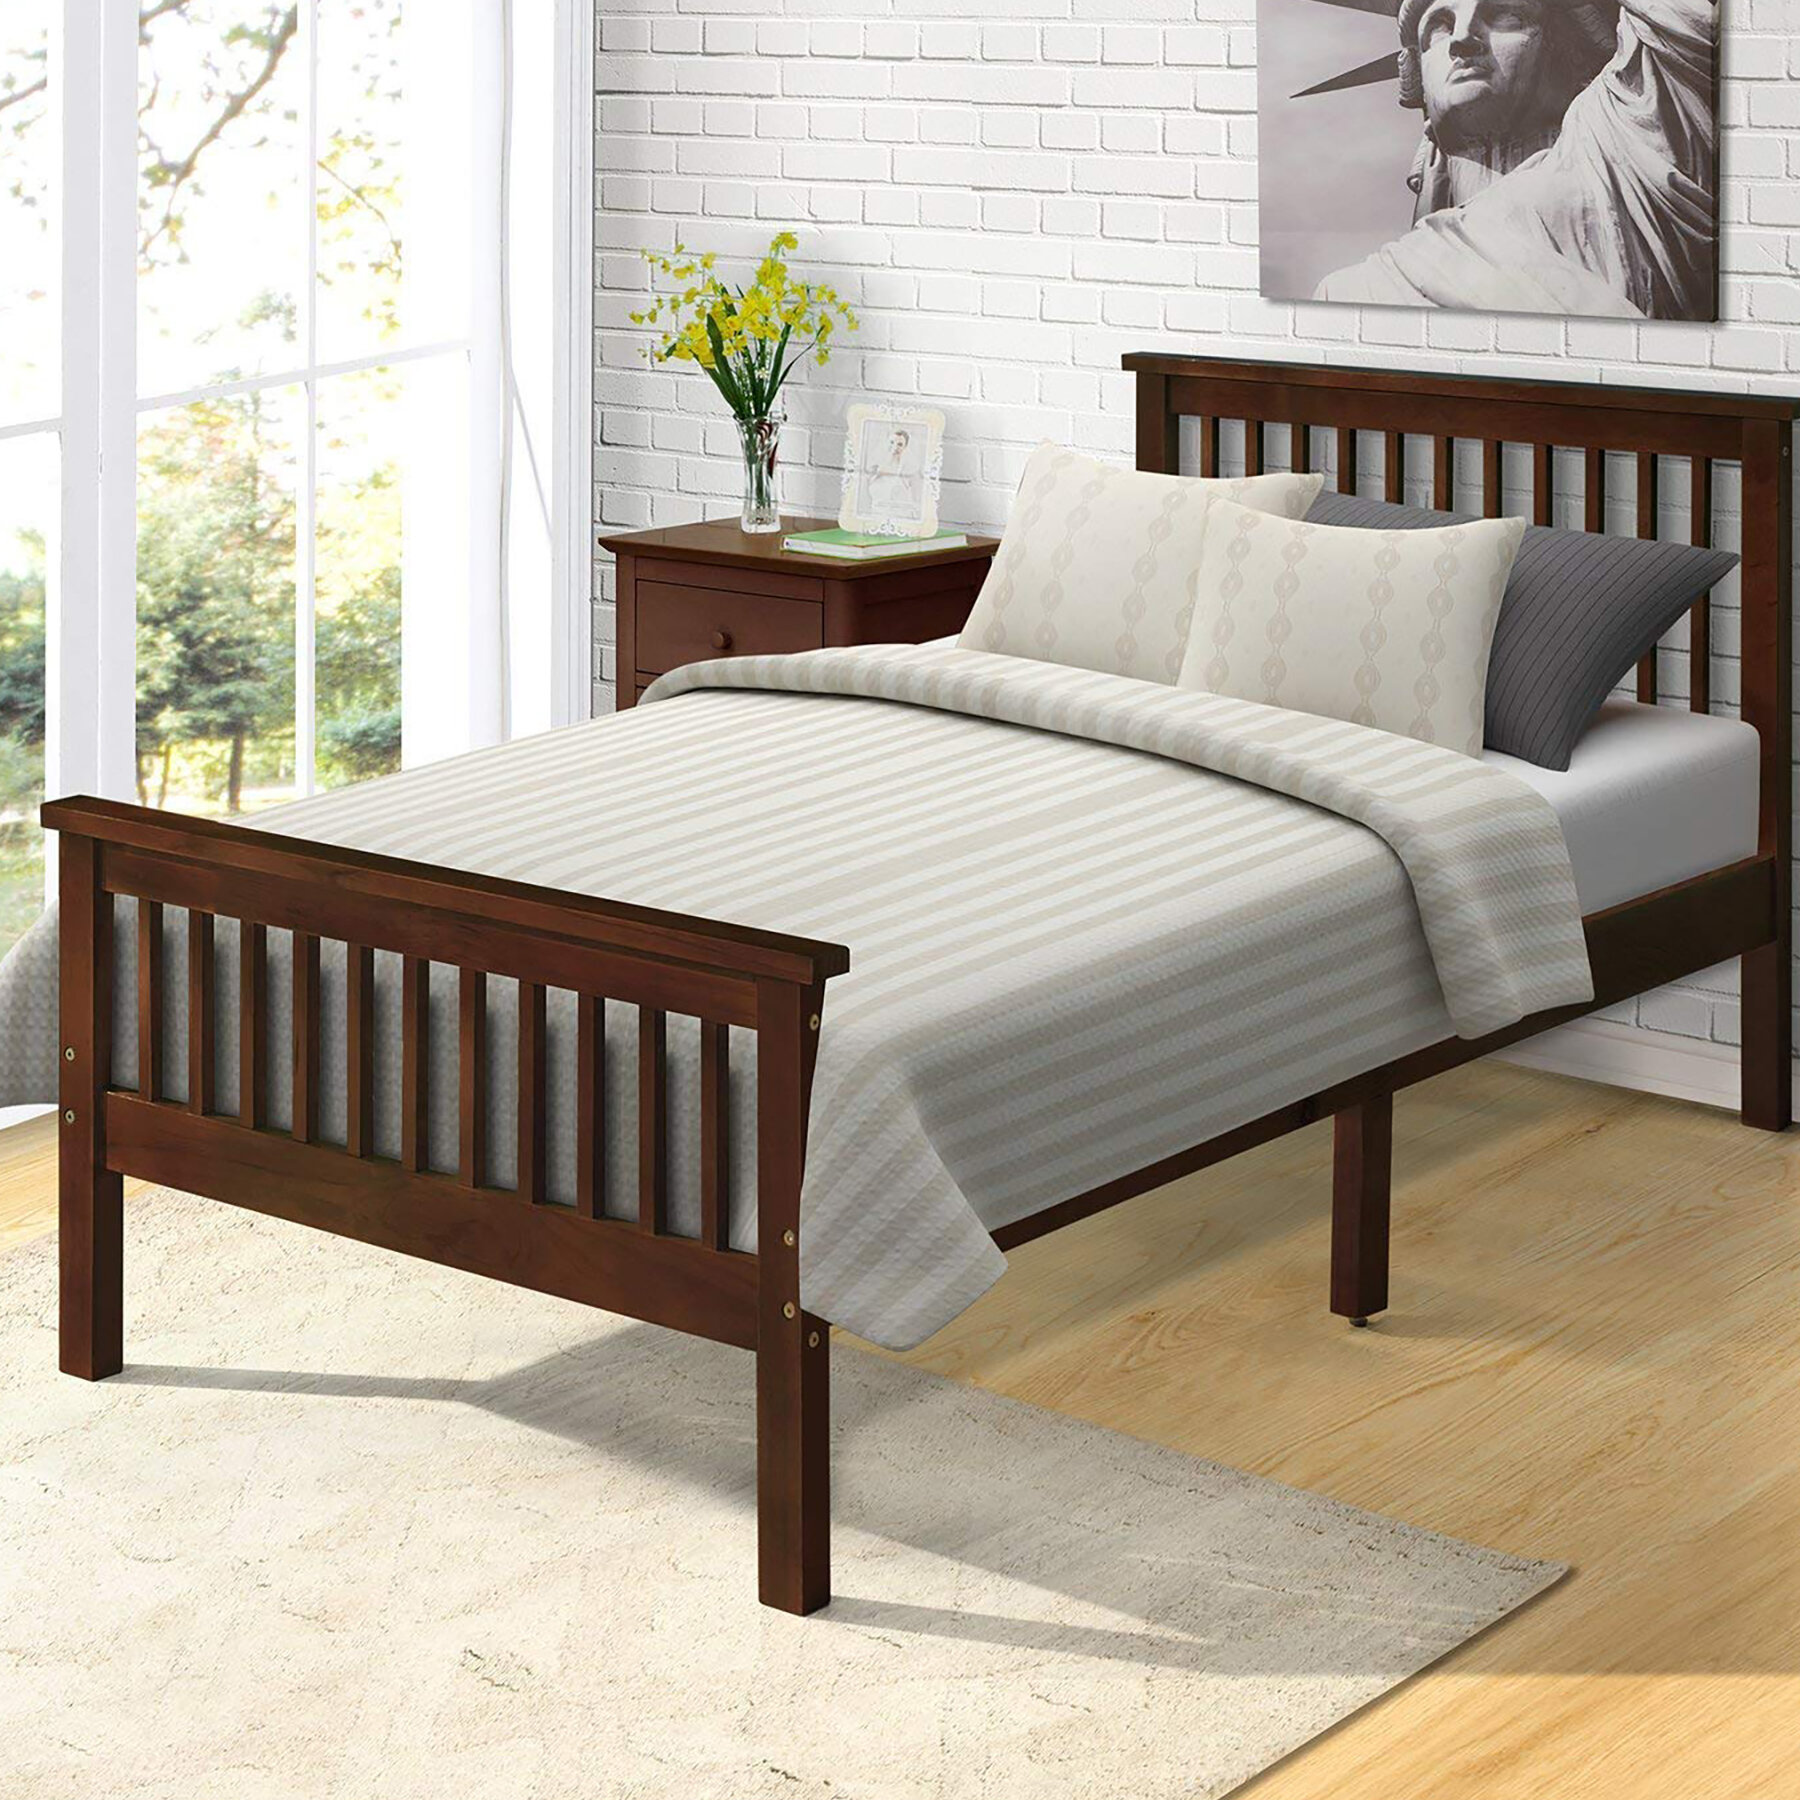 Harriet Bee Leander Twin Platform Bed Reviews Wayfair